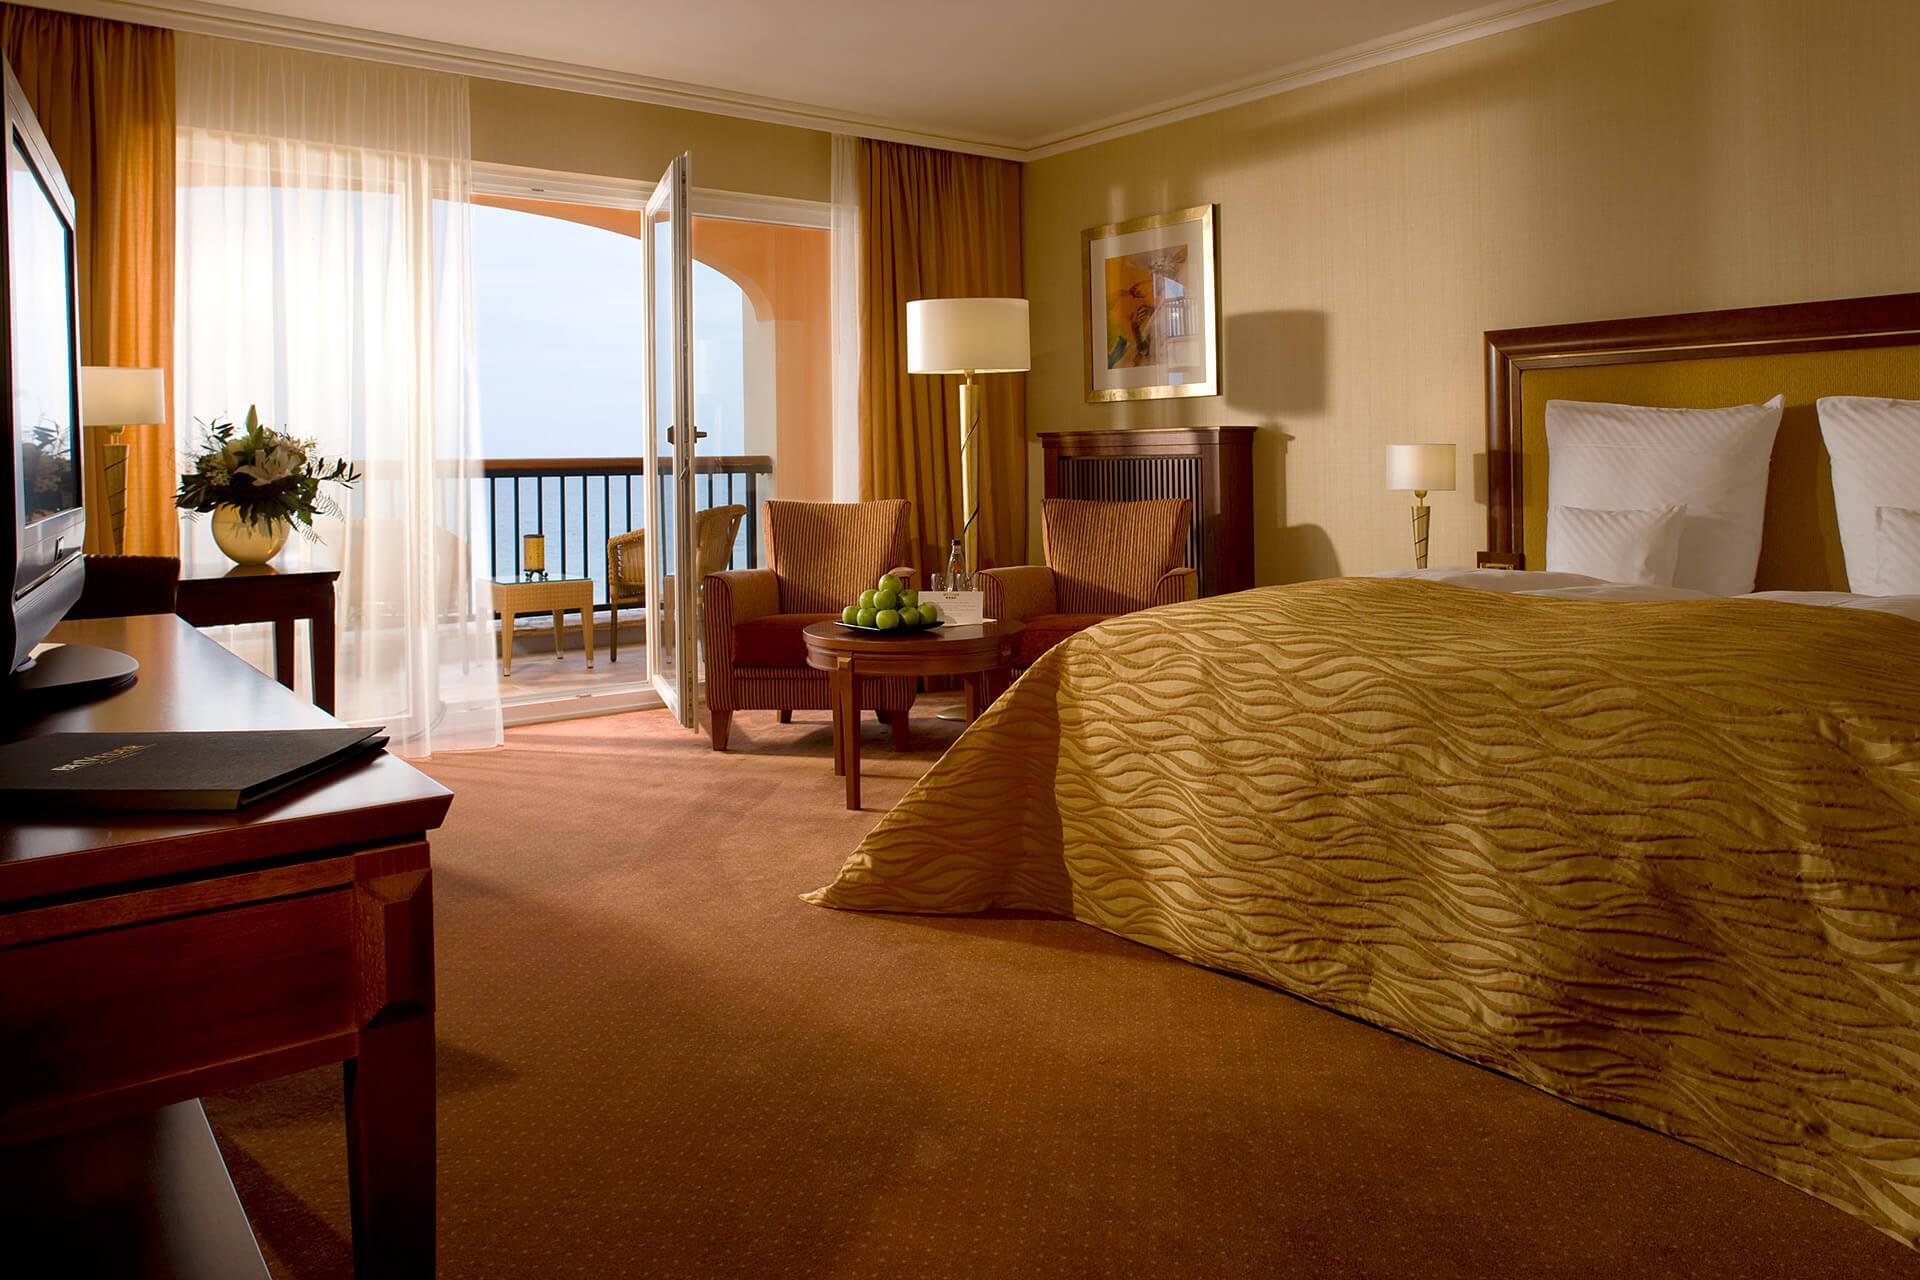 Luxus Spa Hotel Ostsee